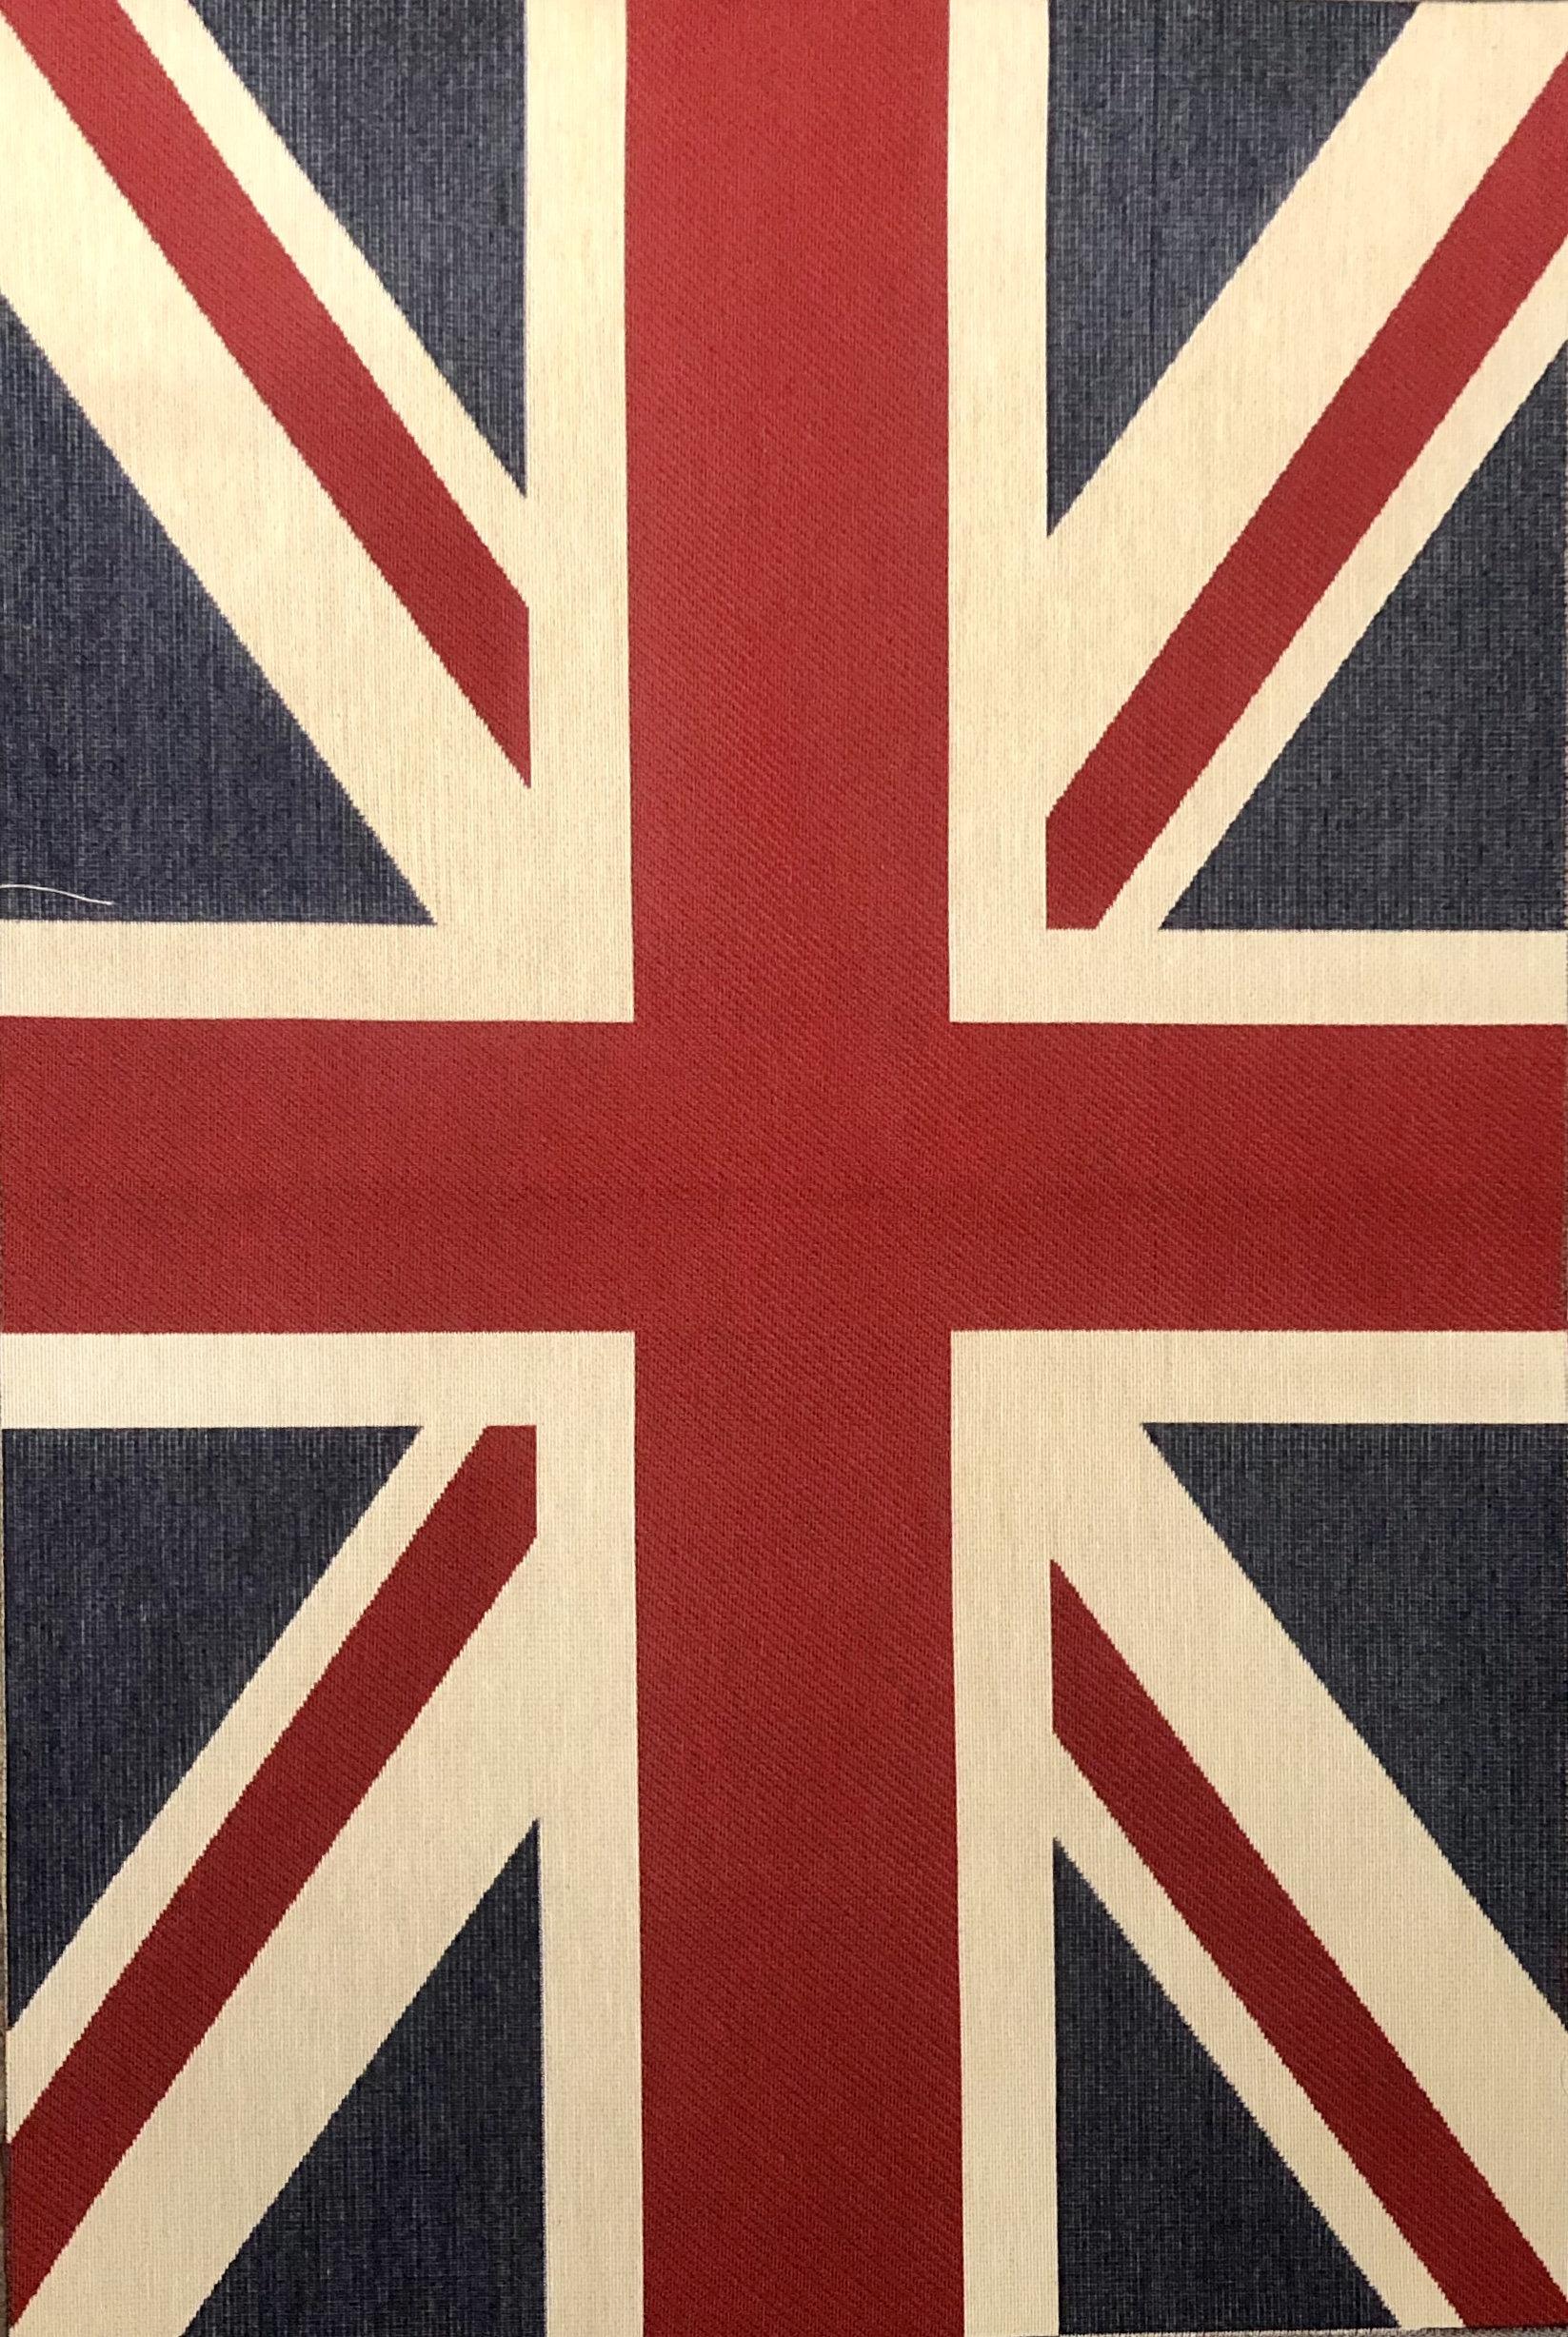 LARGE Union Jack Flag Retro Linen Look Heavy Jacquard Gobelin Upholstery Cotton Bag Cushion Panel Fabric UK Banner 70 X 49 cm or 27'' x 19''